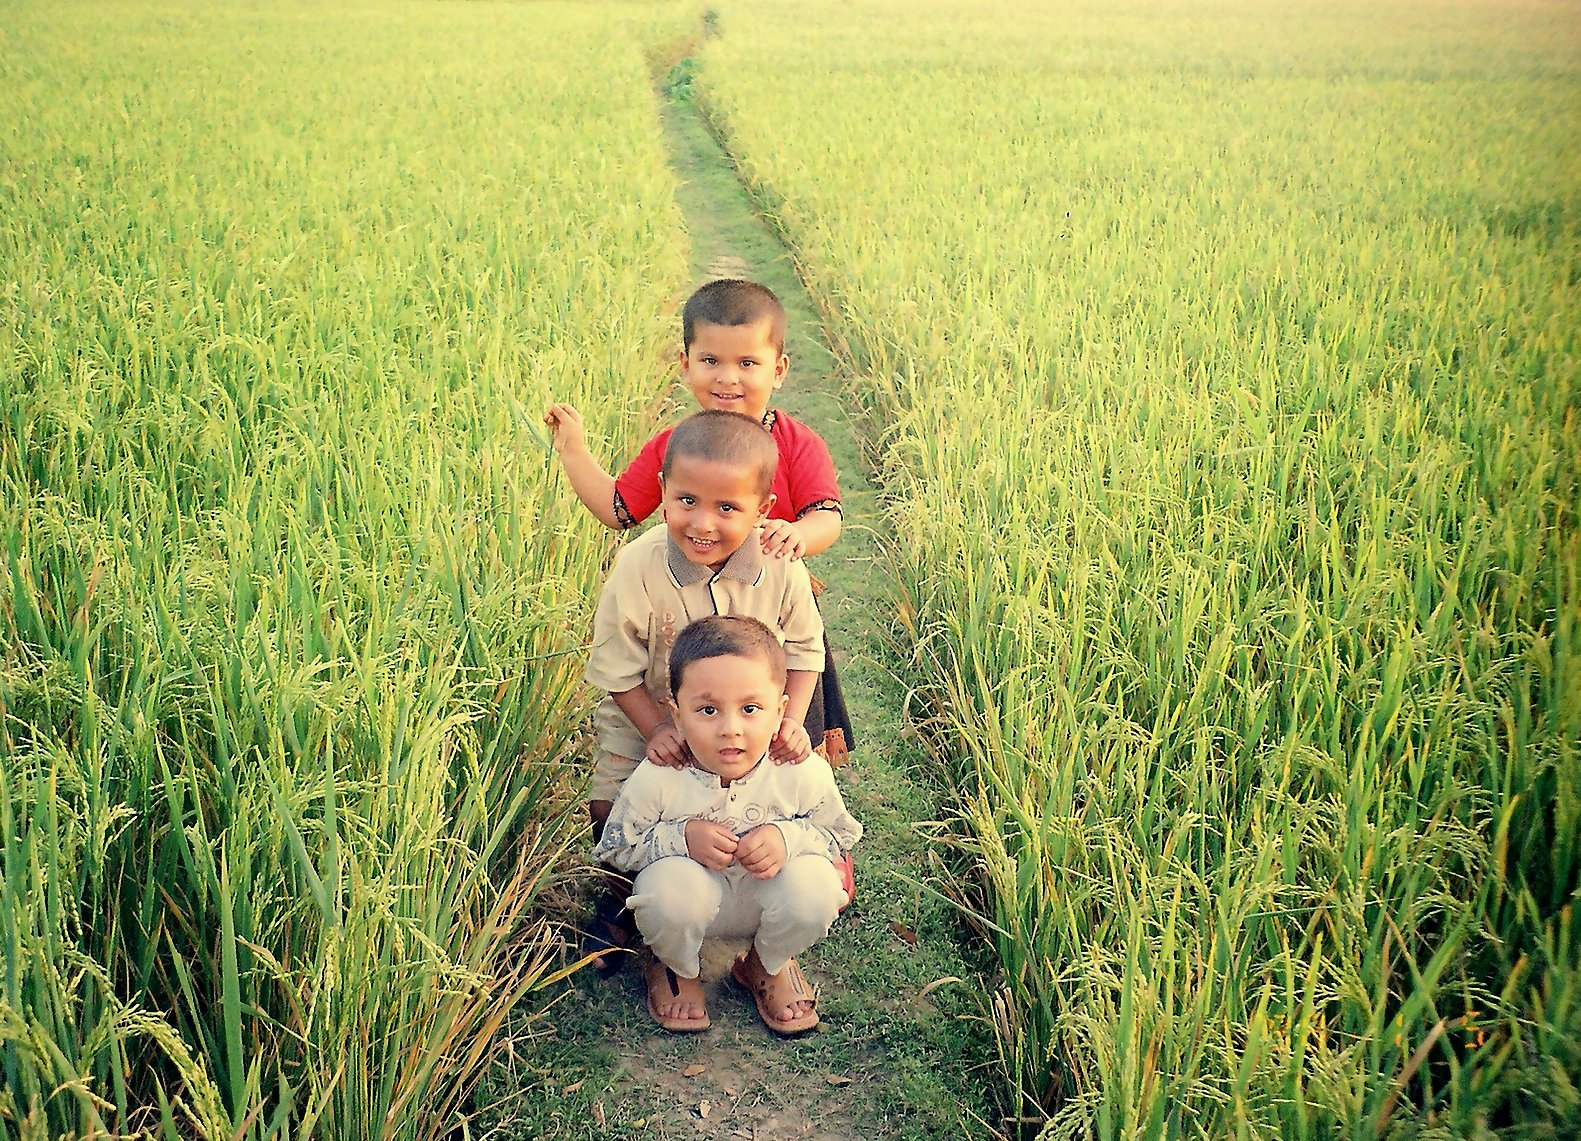 Http Commons Wikimedia Org Wiki File Bangladesh Children In Field Jpg